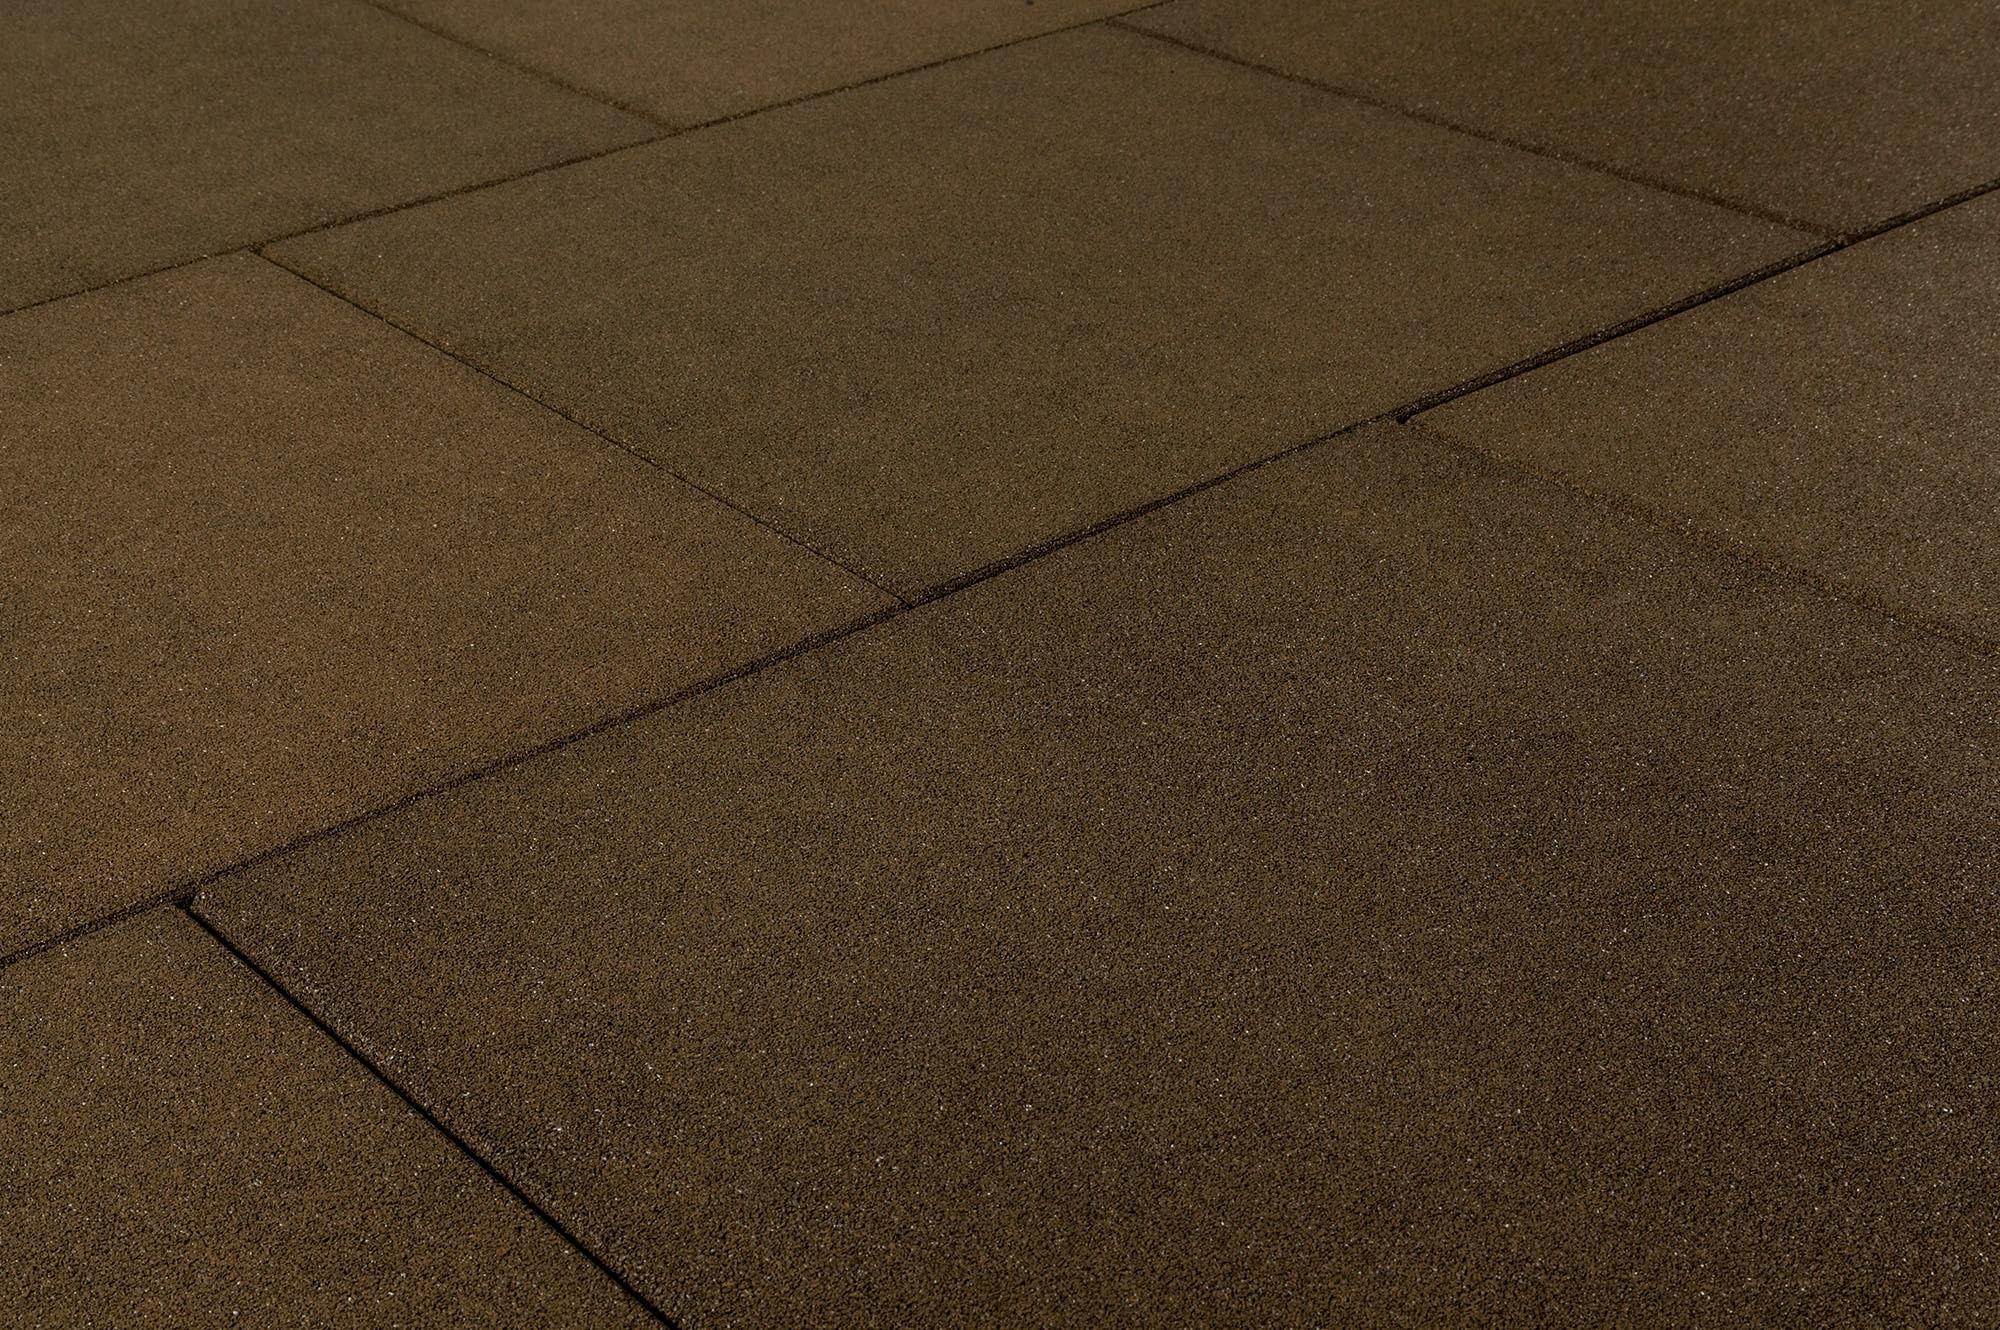 Brava Outdoor Prestige Rubber Tiles Pigment Stone Brown 24